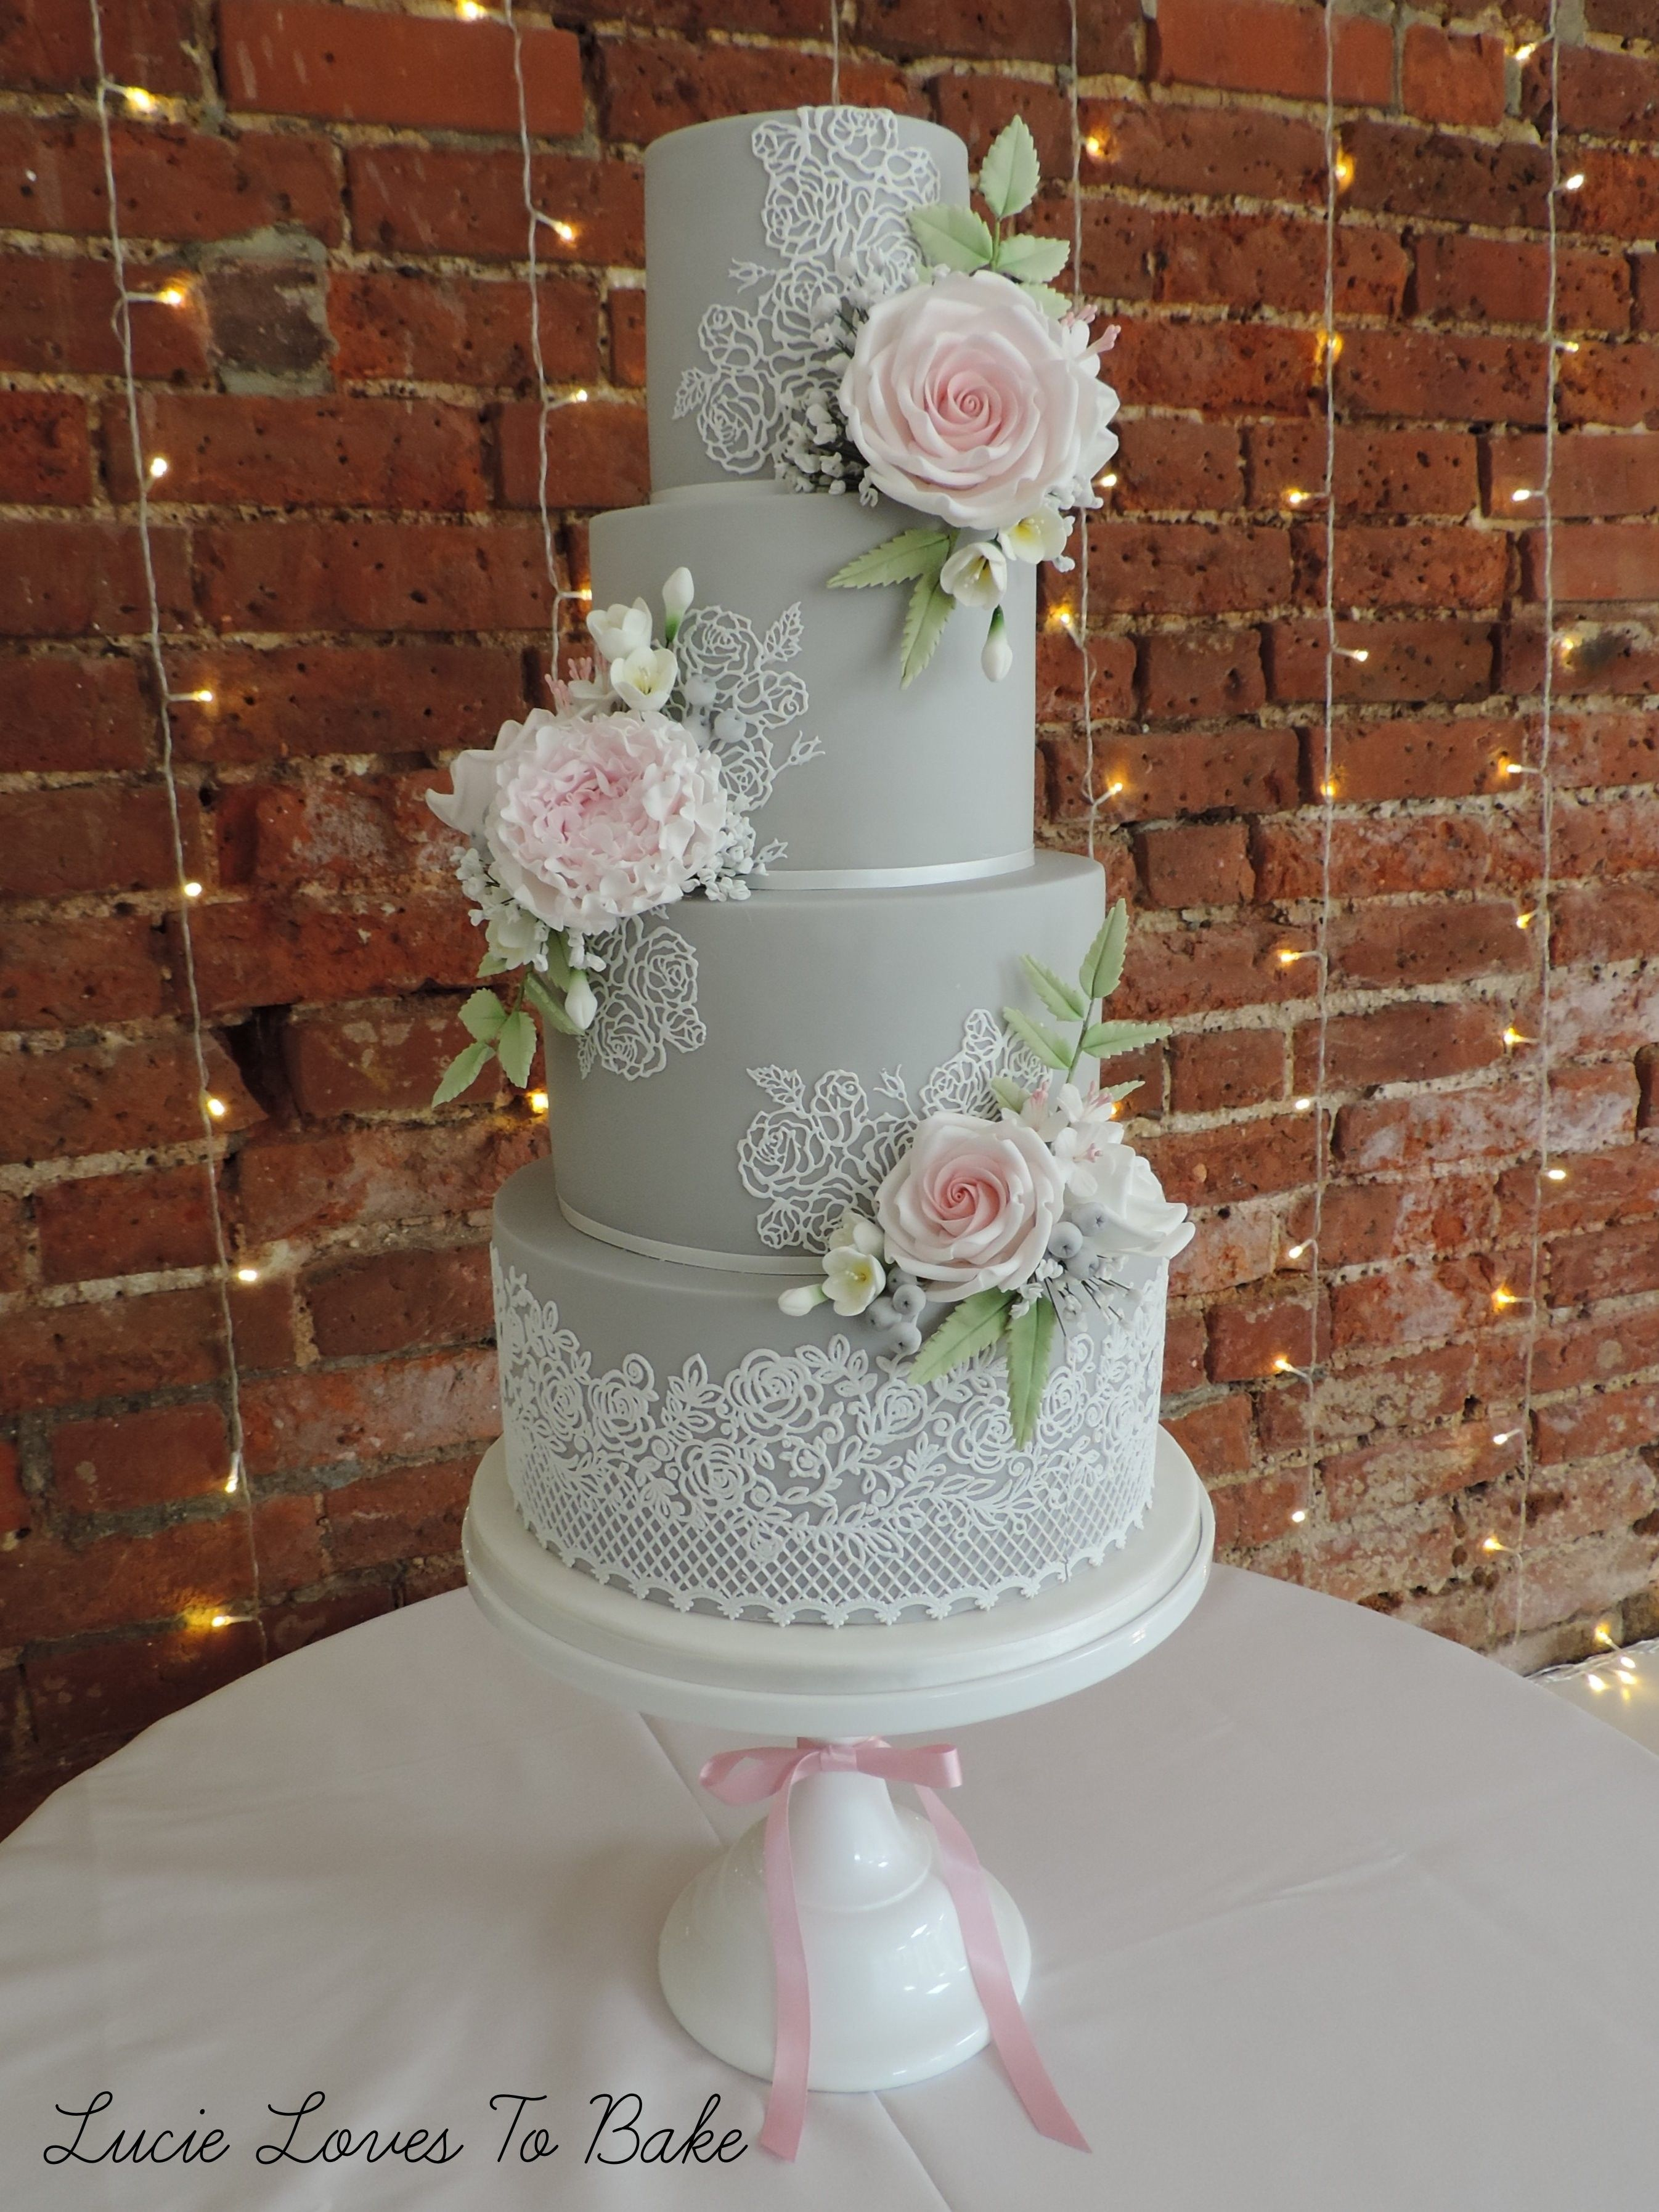 17 Steal-Worthy Wedding Cake Ideas for a Parisian-Themed Summer Wedding